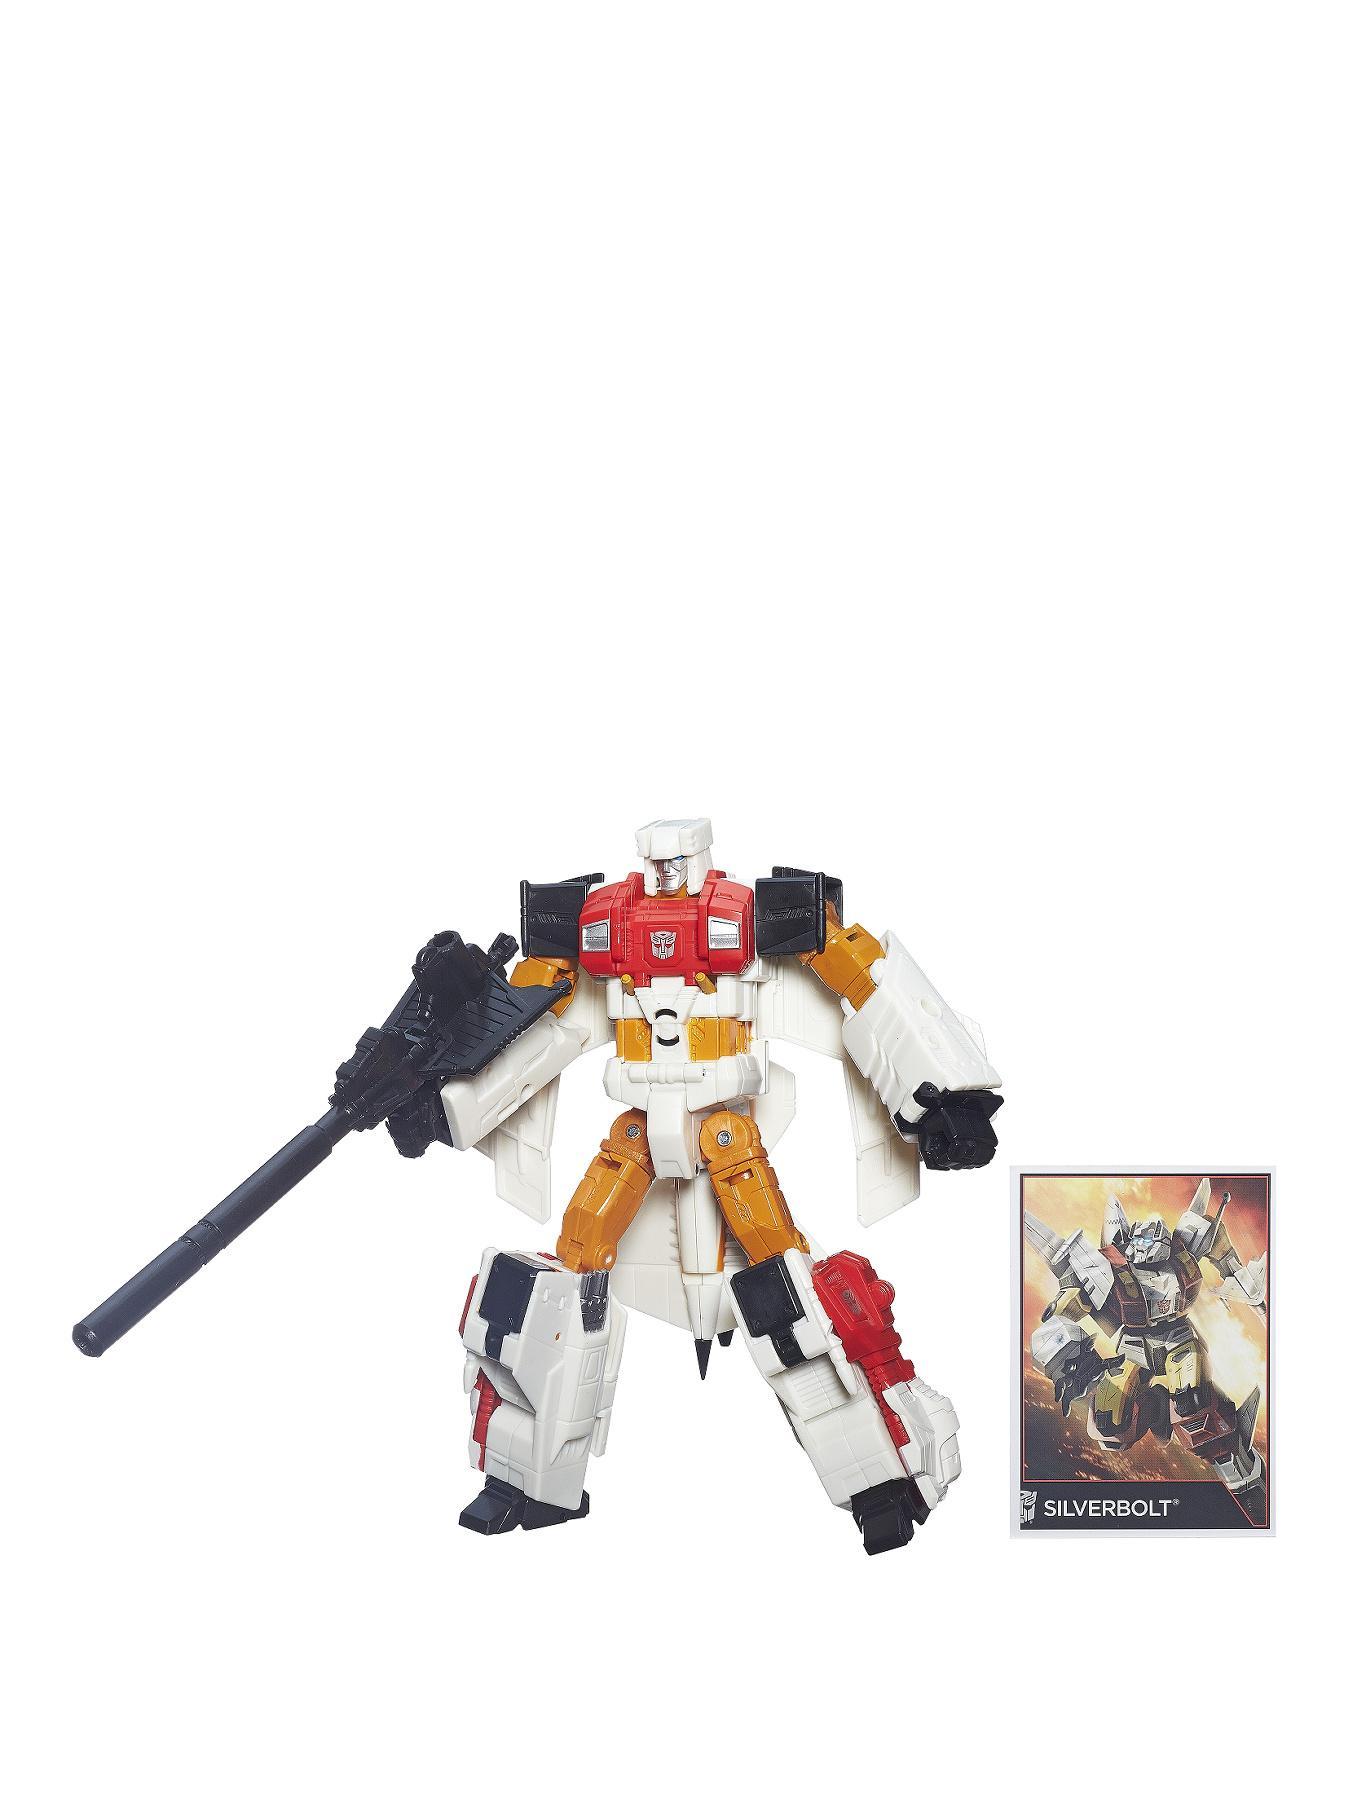 Transformers Generations Combiner Wars Voyager Class Figure - Silverbolt